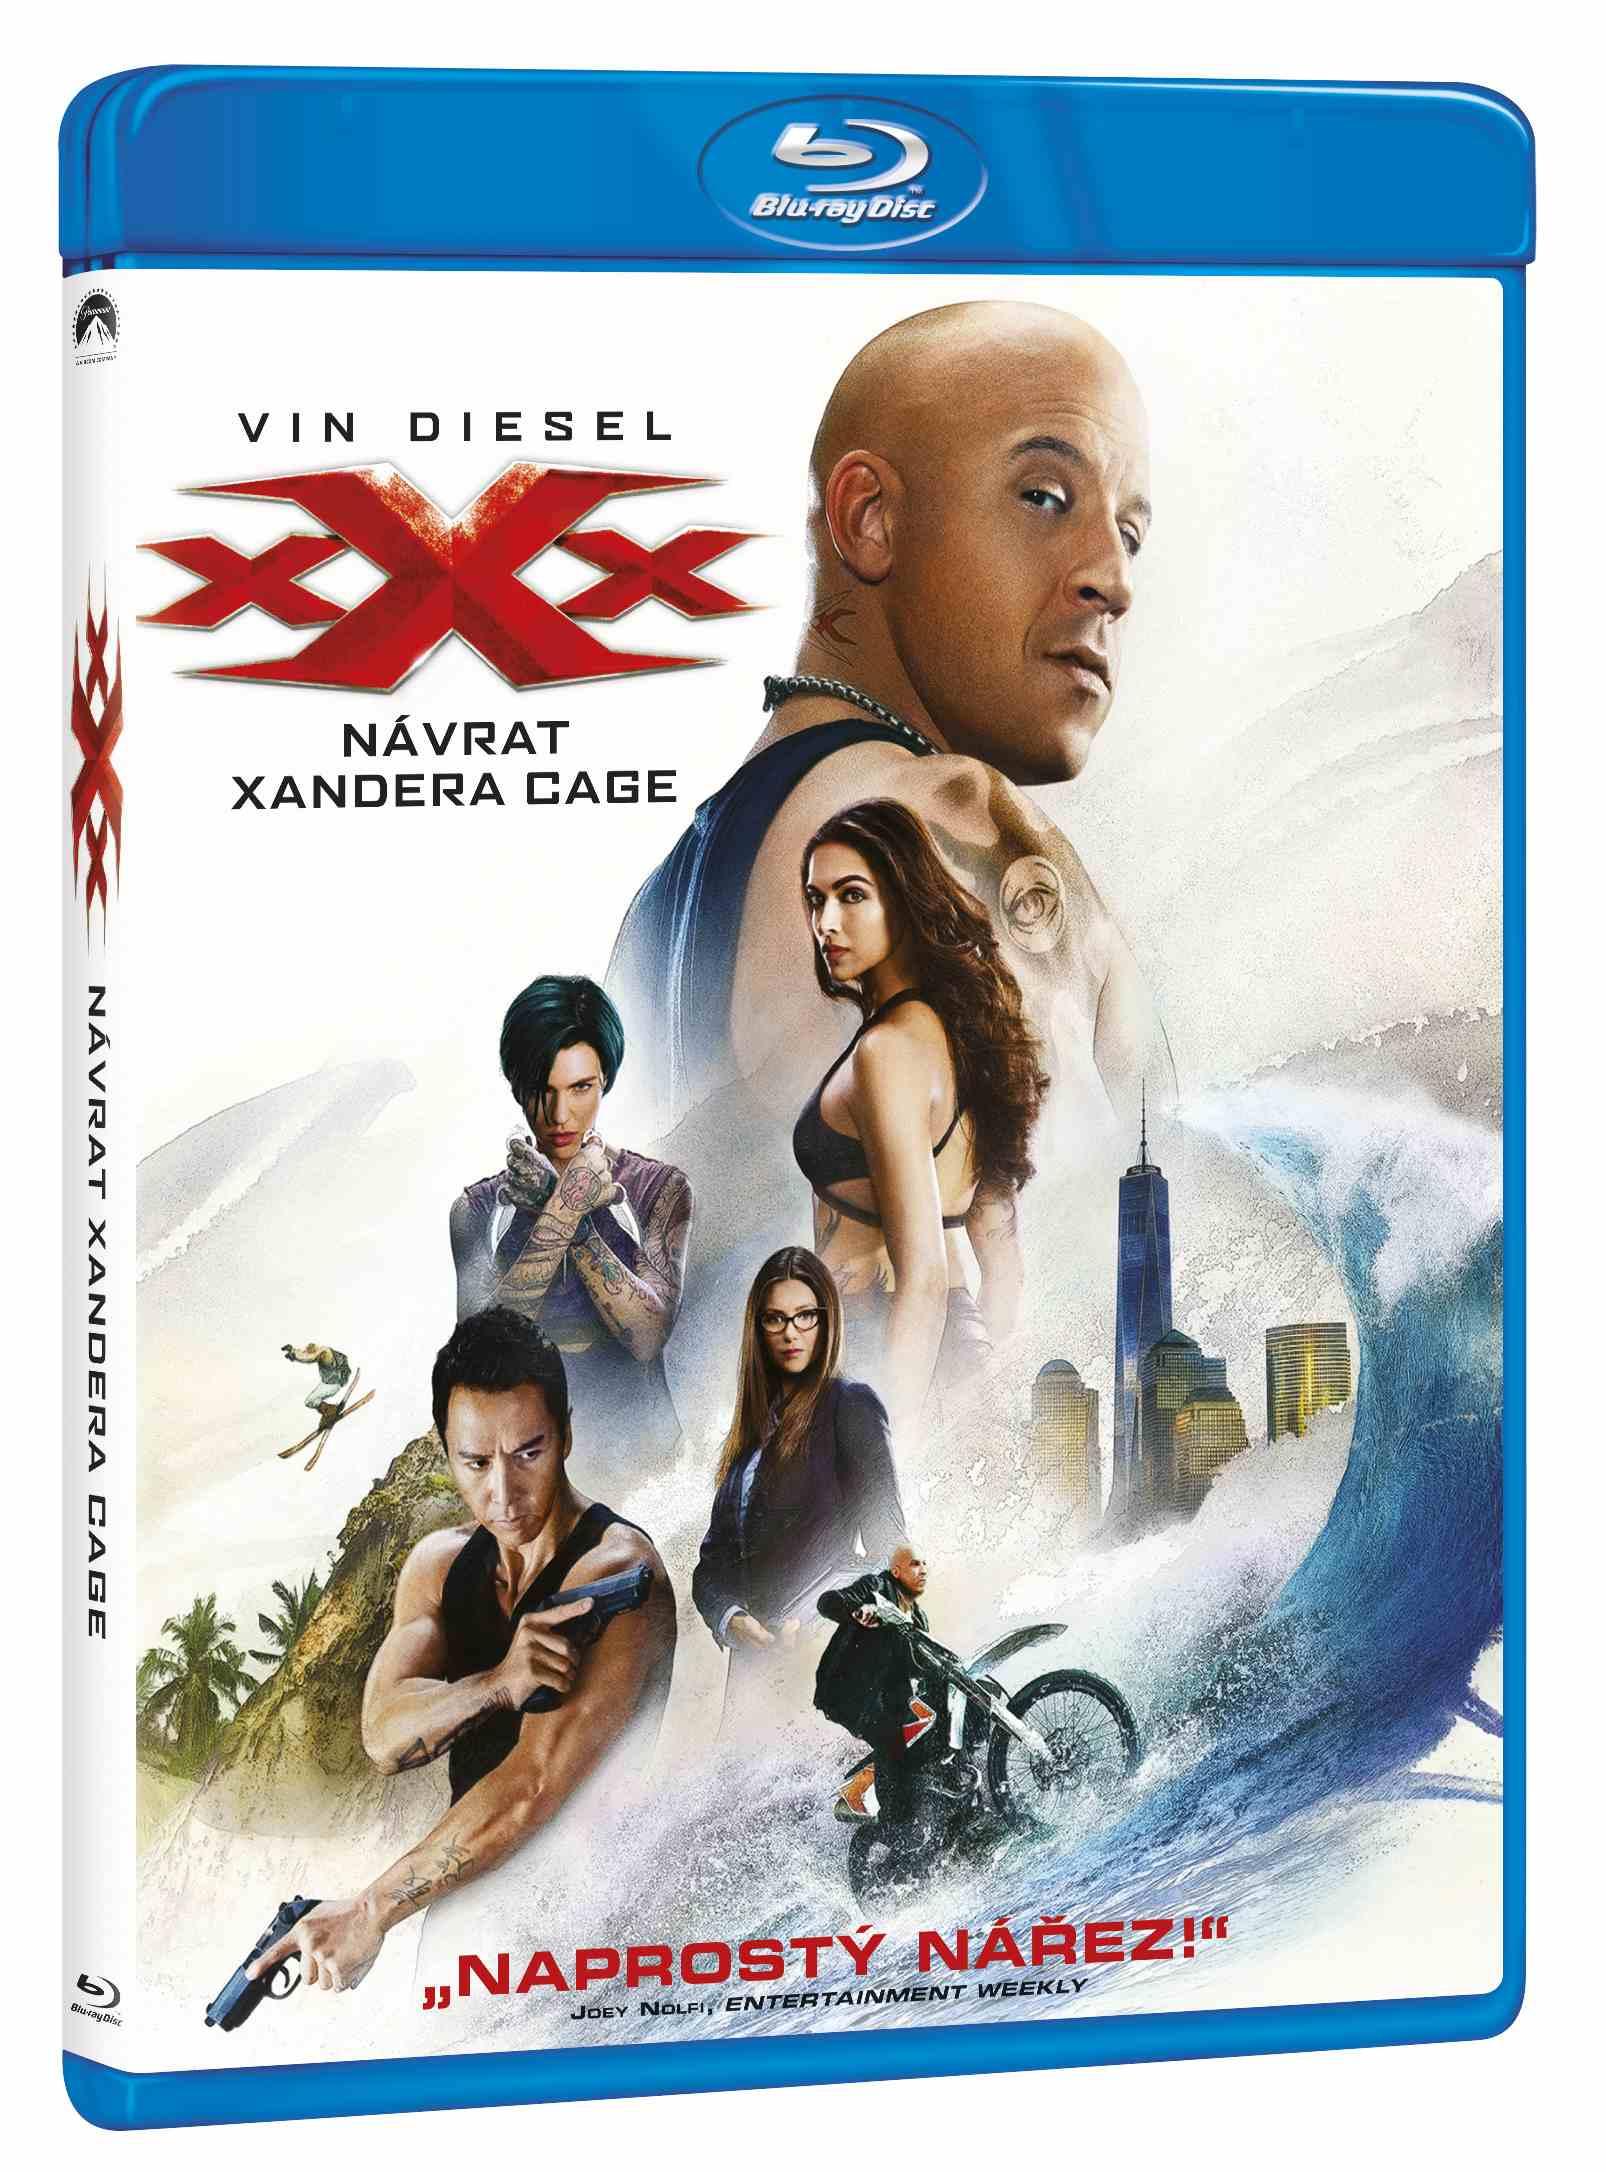 xXx: NÁVRAT XANDERA CAGE - Blu-ray